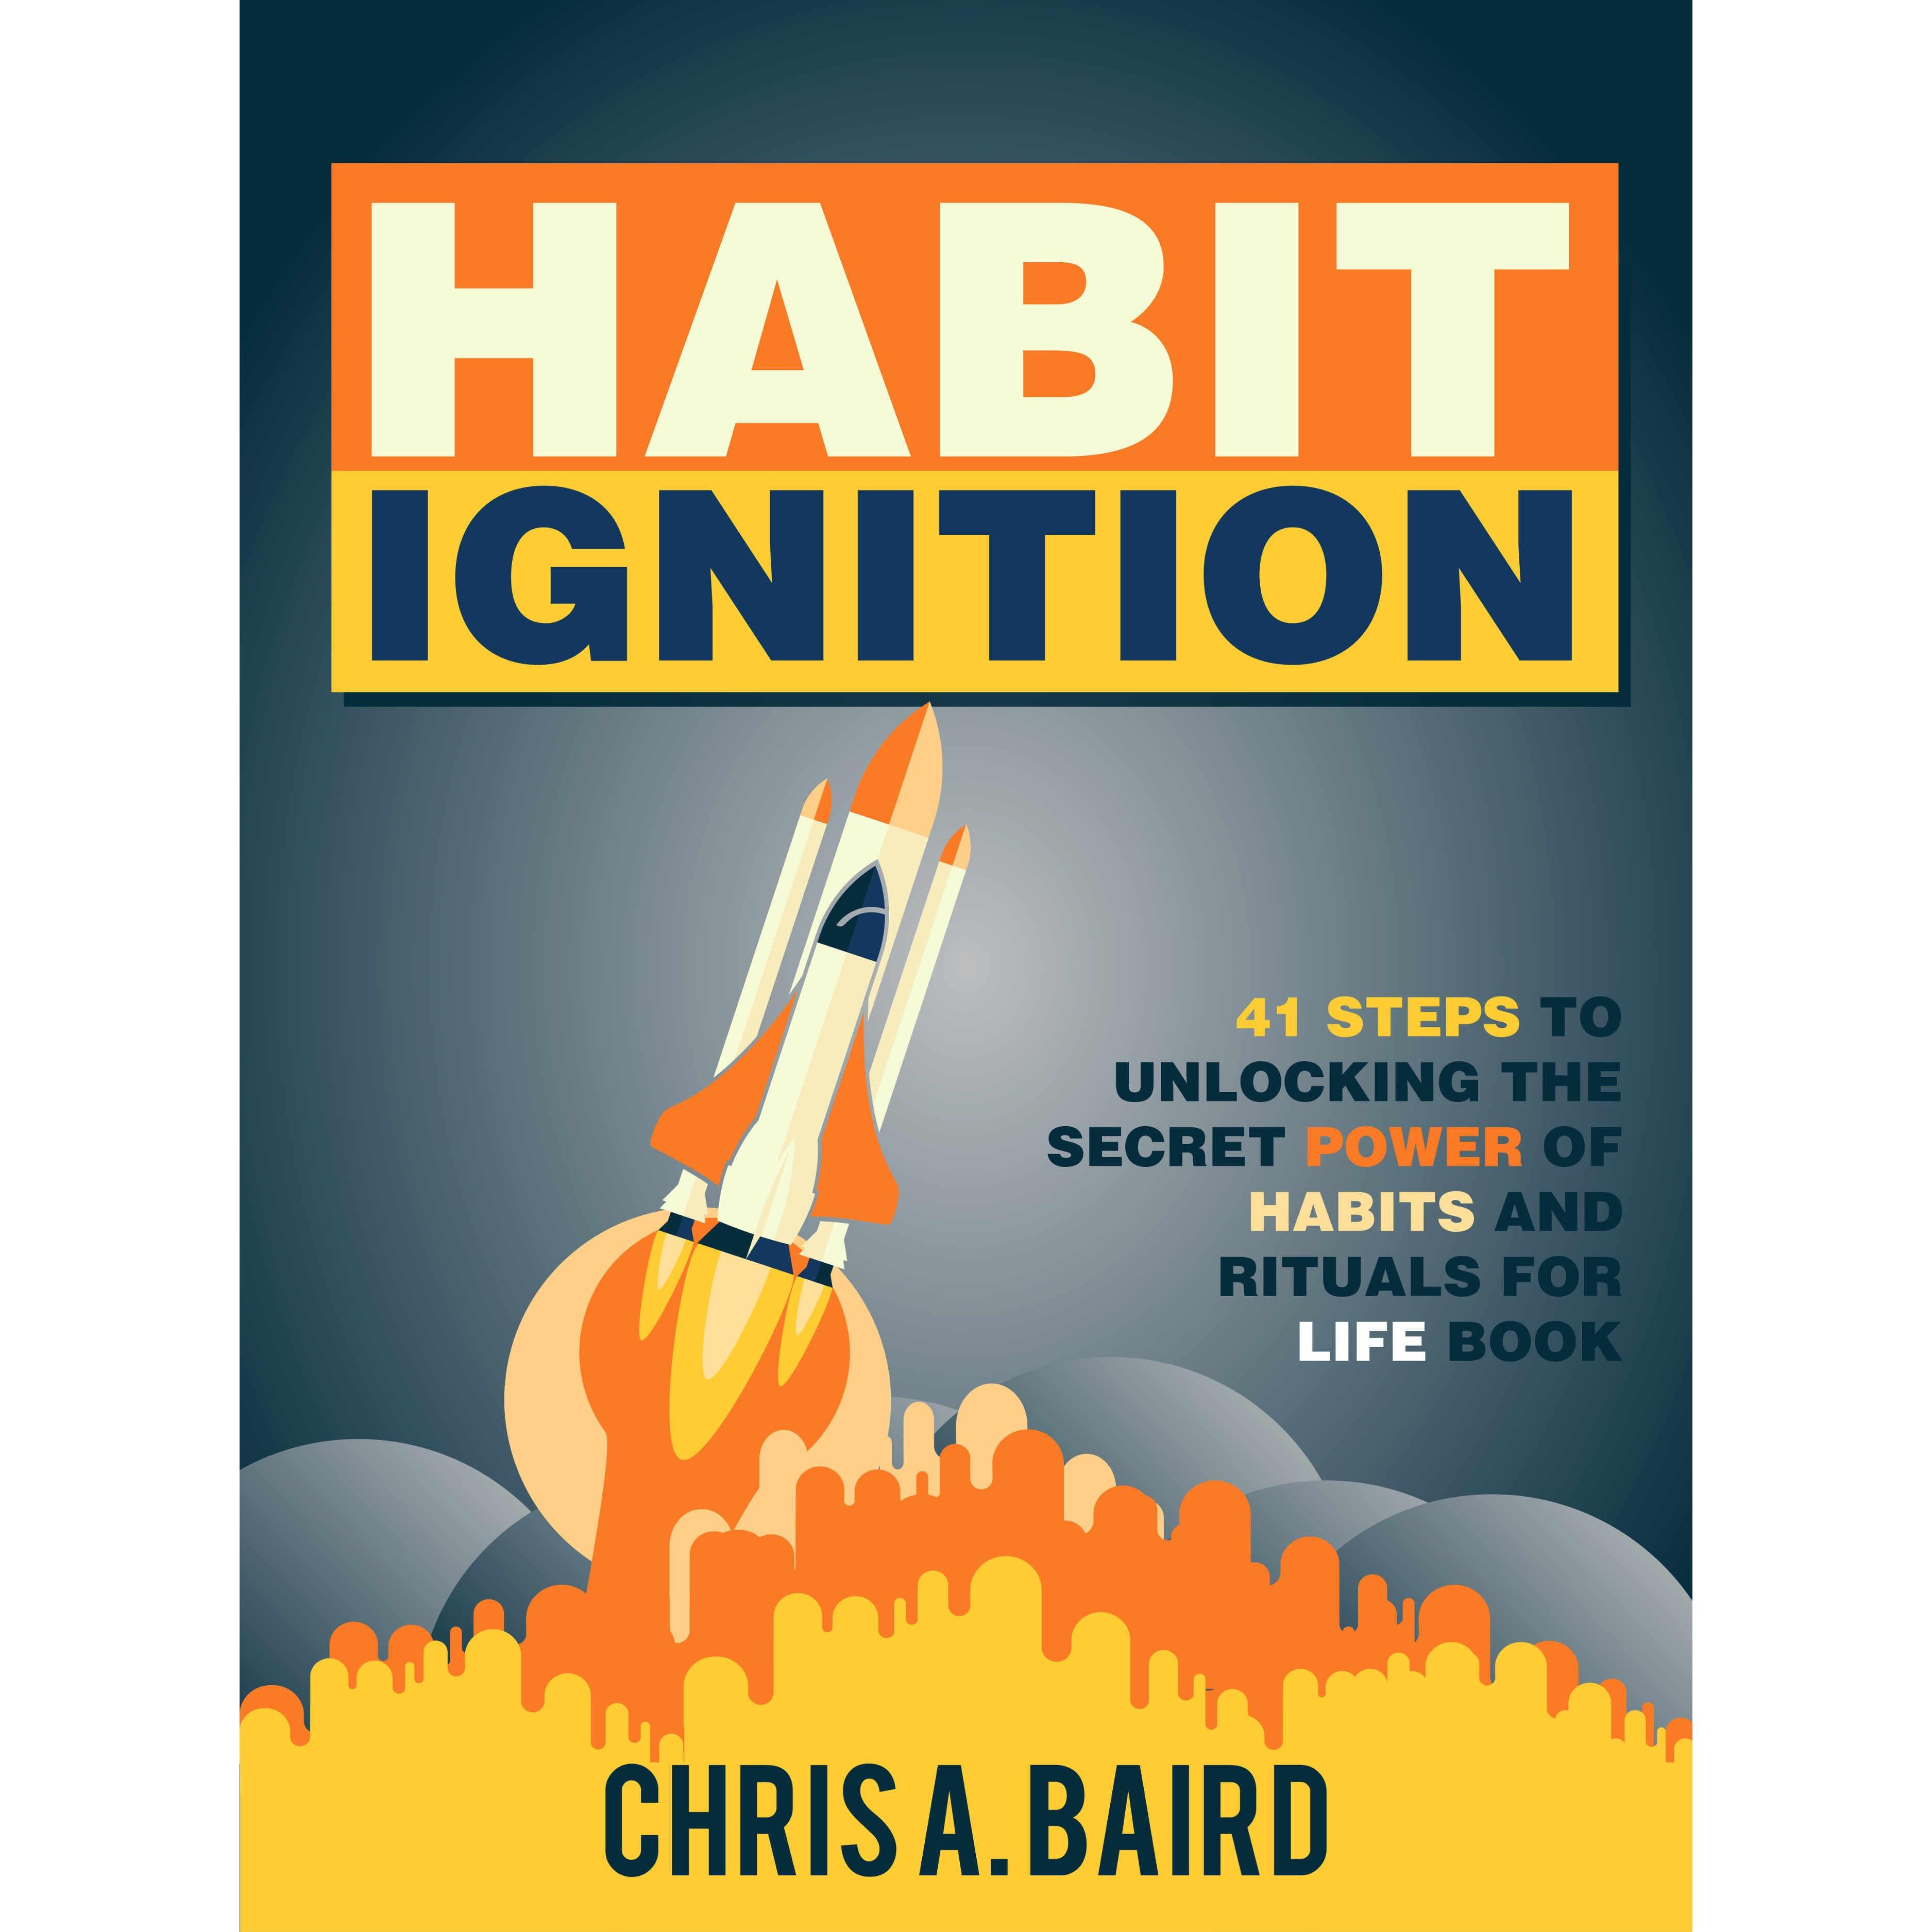 Habit Ignition 41 Steps To Unlocking The Secret Power Of